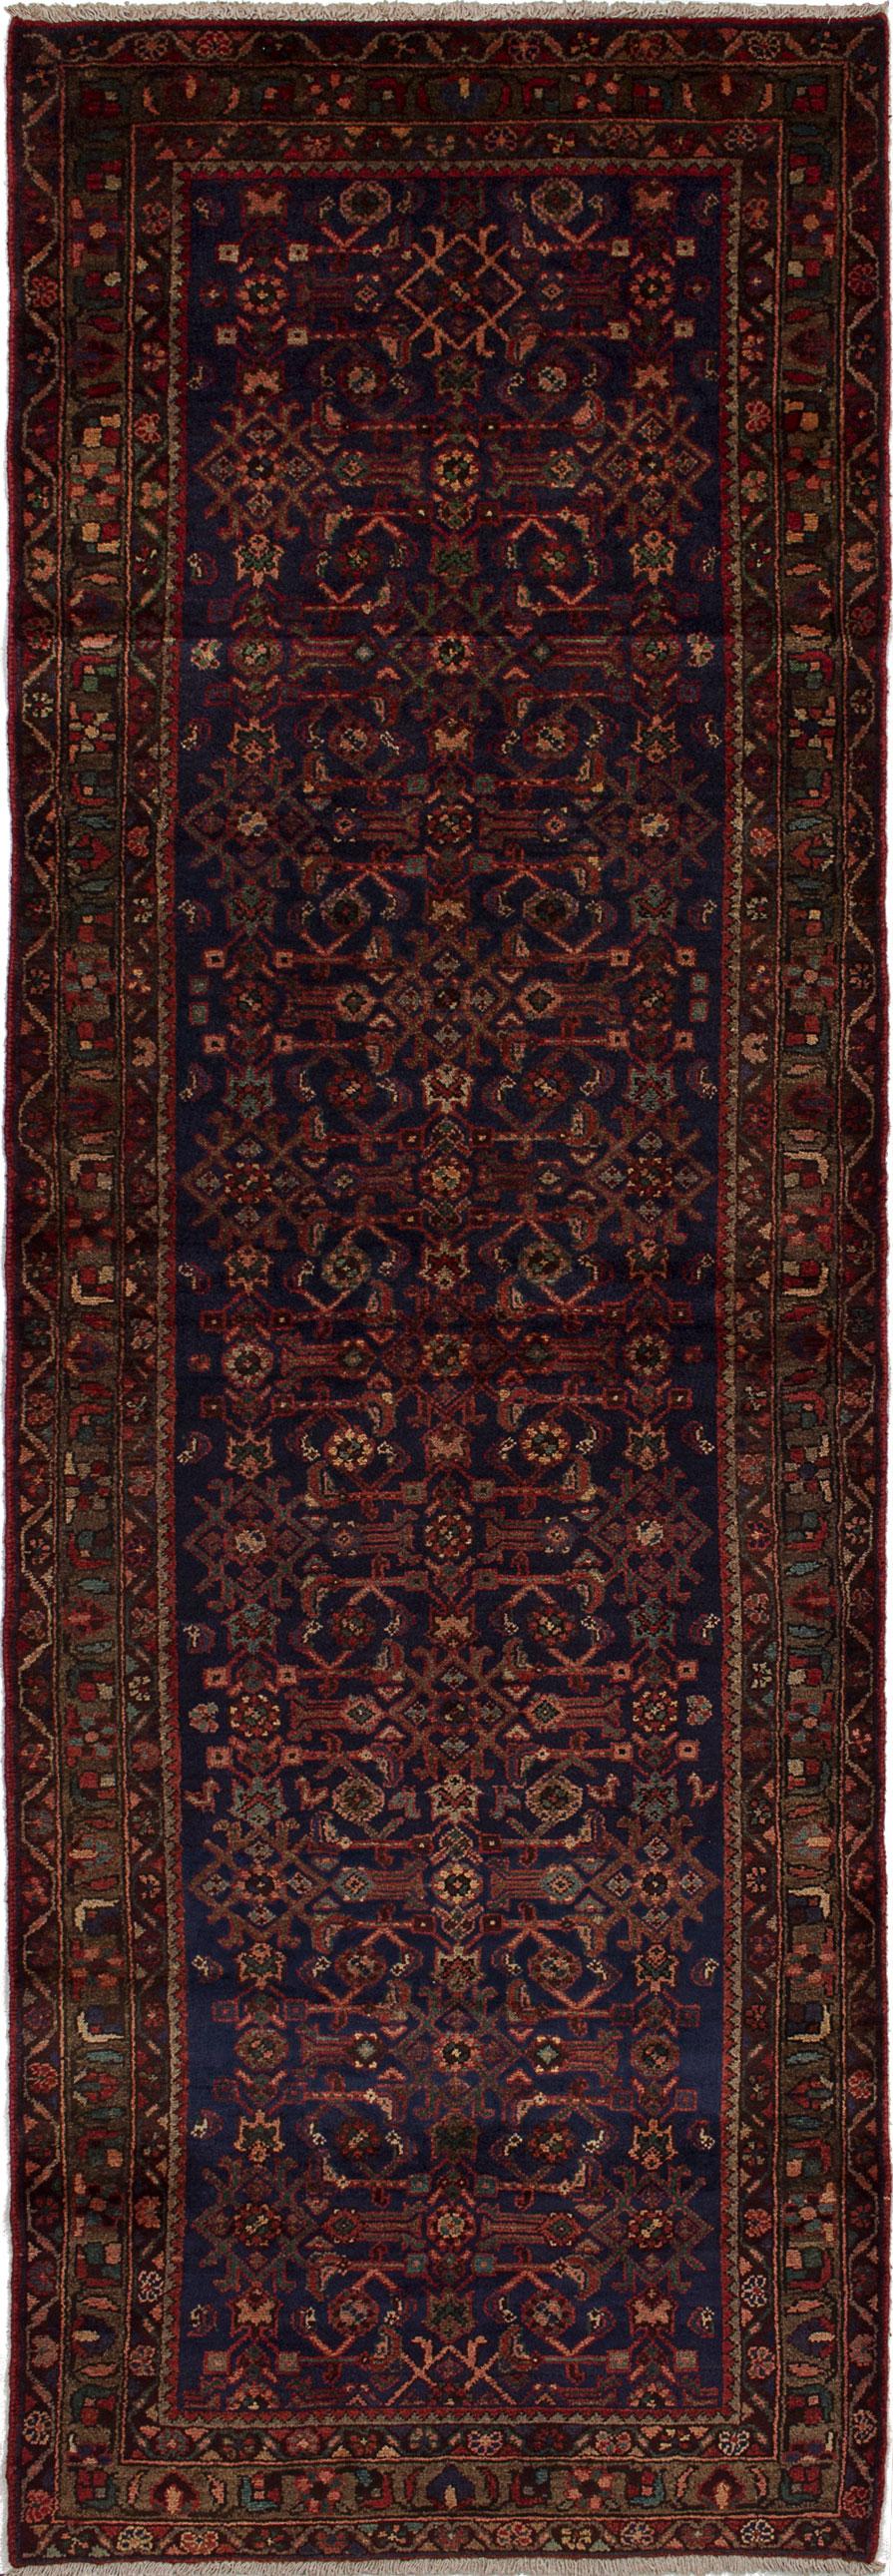 "Hand-knotted Hamadan Dark Blue Wool Rug 3'5"" x 9'11"" Size: 3'5"" x 9'11"""